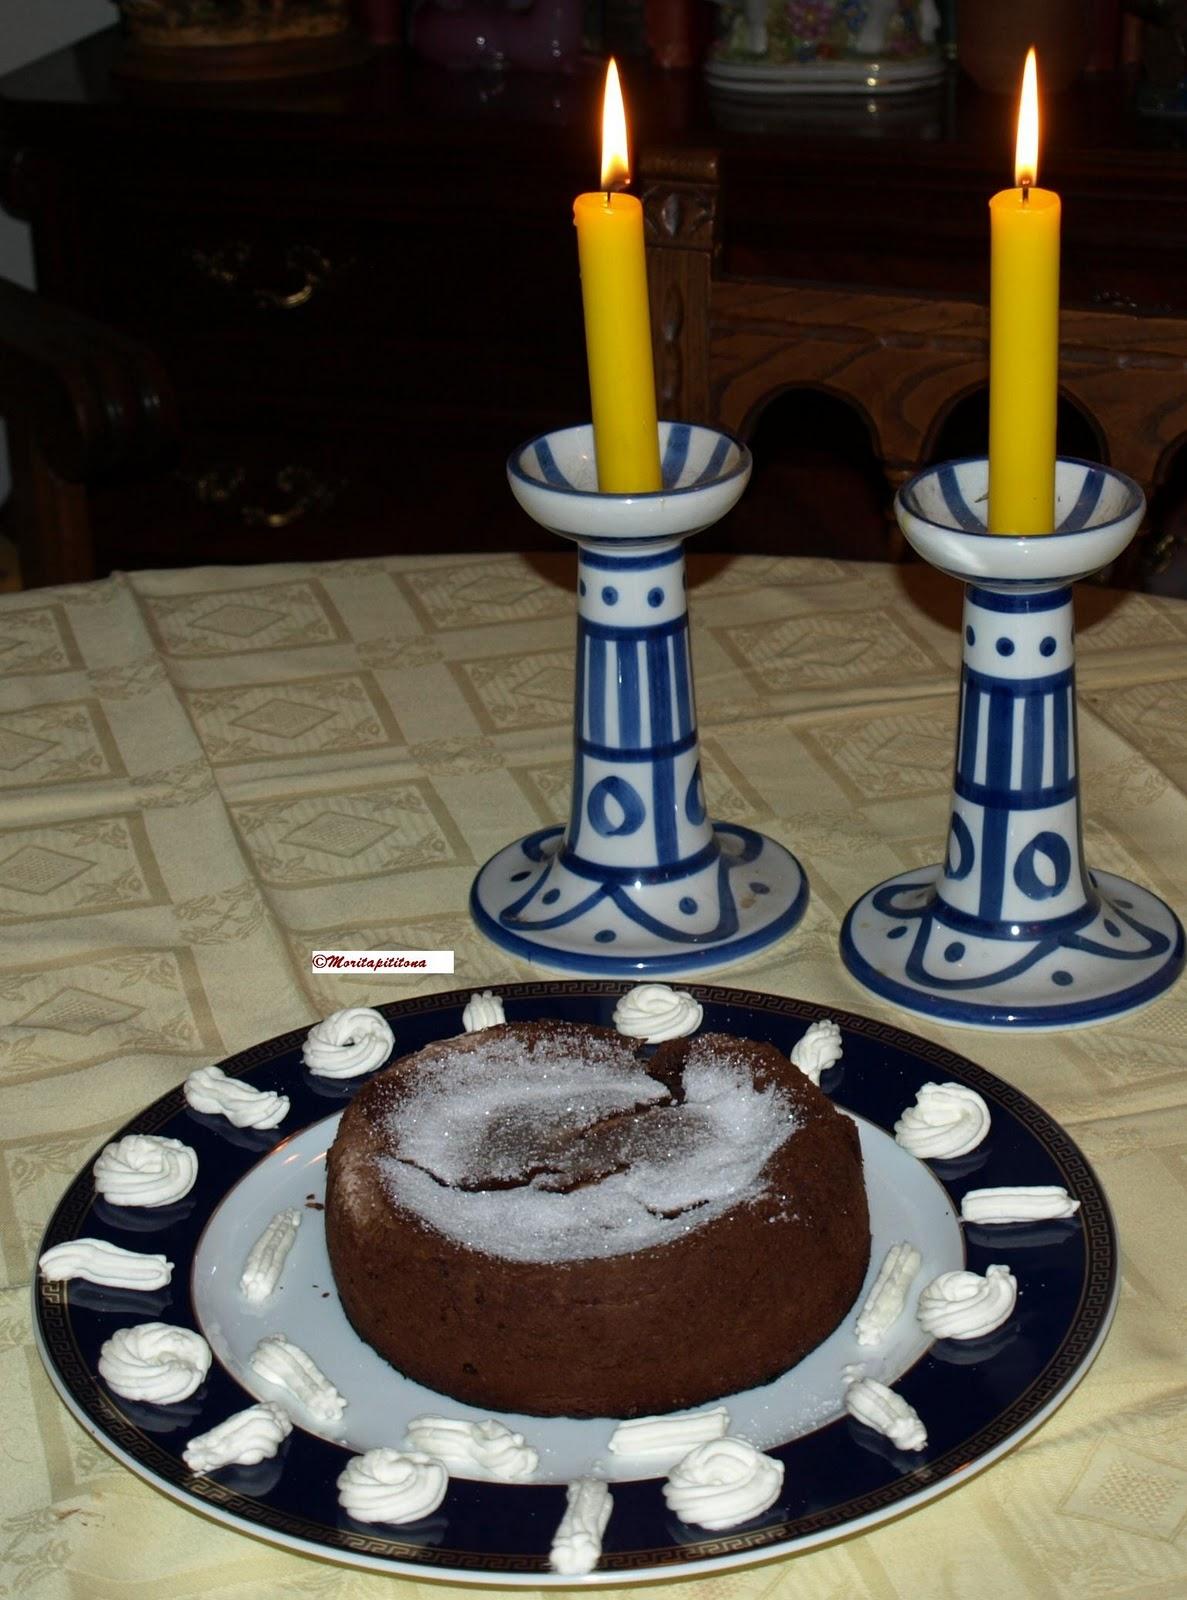 Http Www Foodandwine Com Recipes Molten Chocolate Cake Peanut Butter Filling